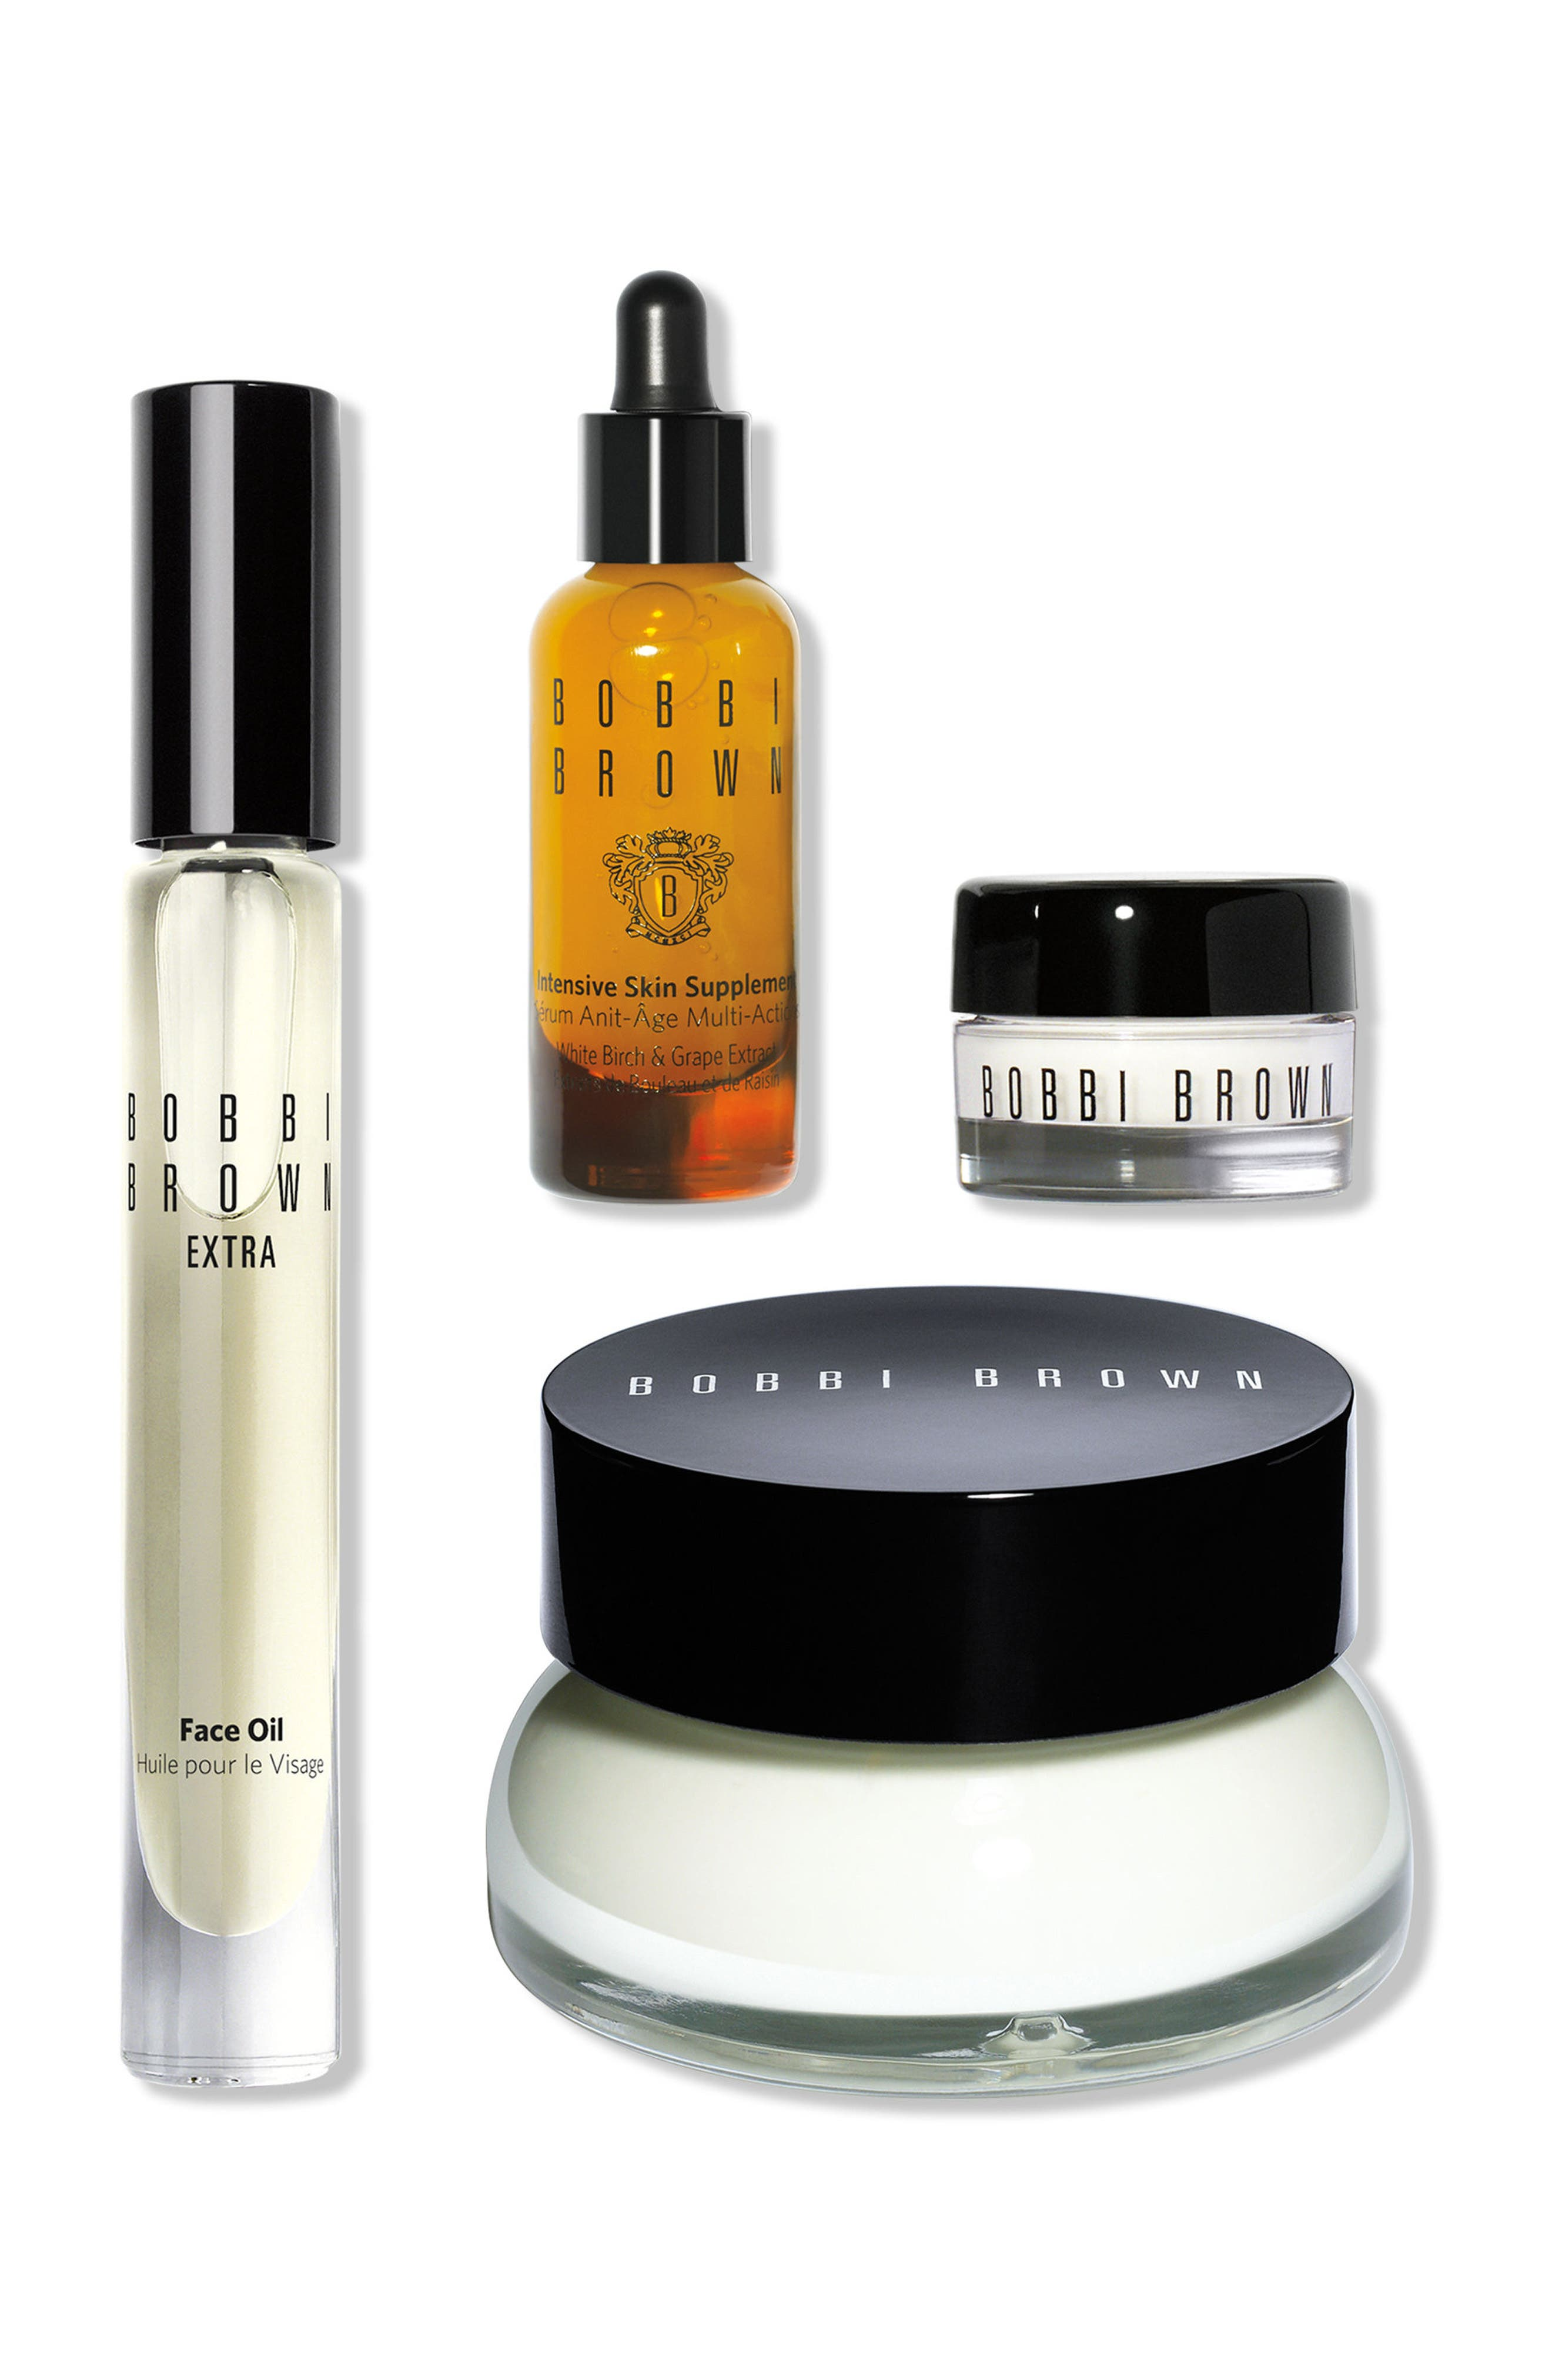 Alternate Image 1 Selected - Bobbi Brown Nourish & Glow Skin Care Set (Nordstrom Exclusive) ($170.40 Value)